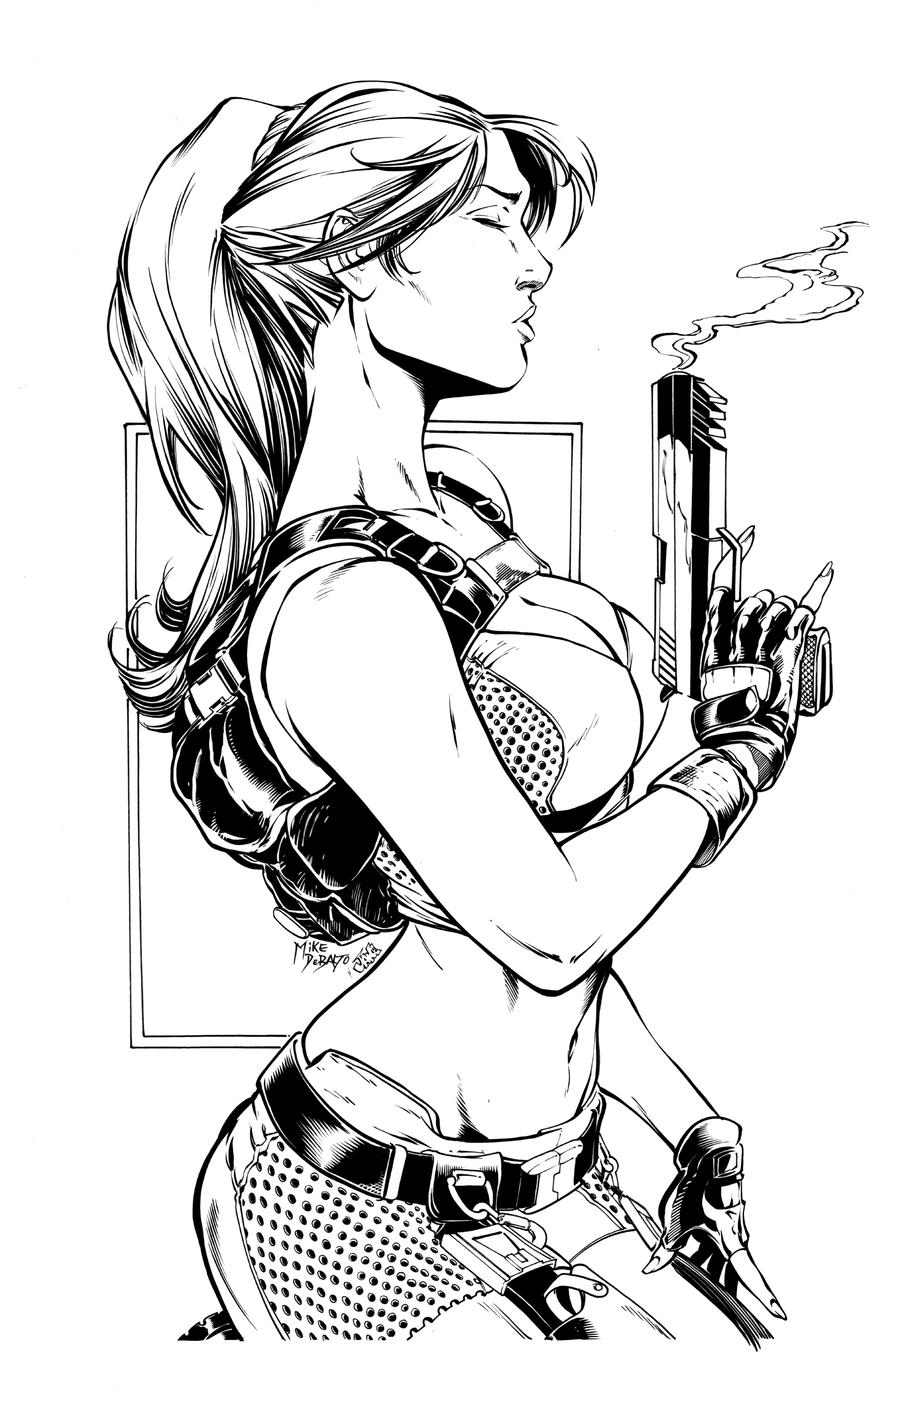 Lara Croft ink by Inker-guy